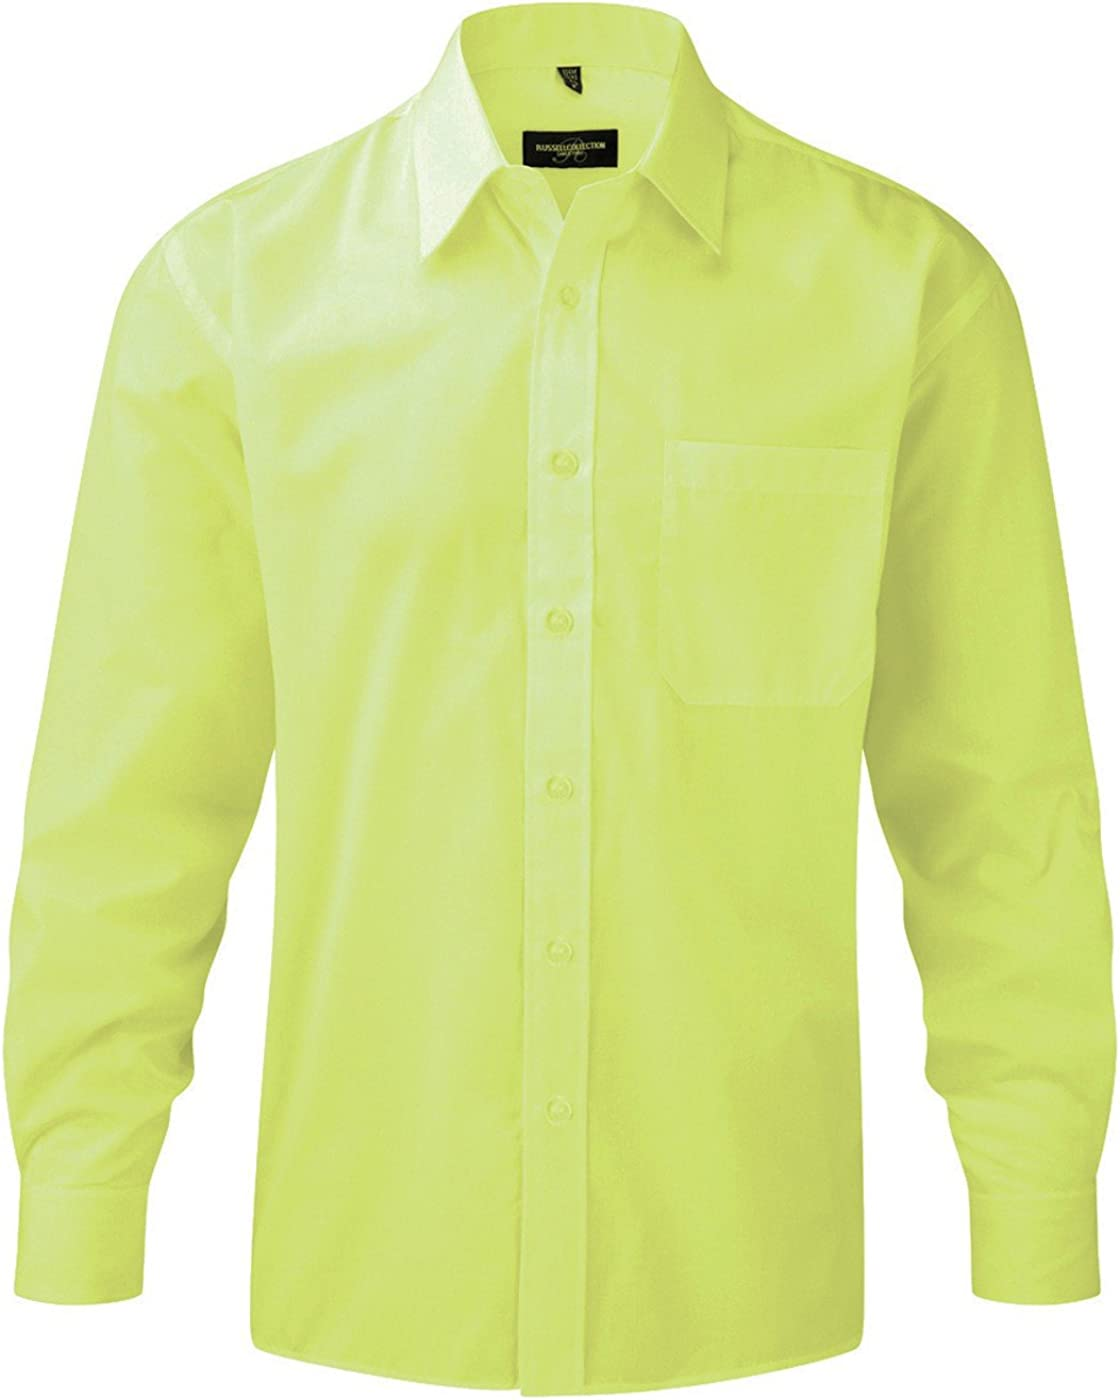 Russell Z934 - Camisa de popelina de manga larga, para Hombre